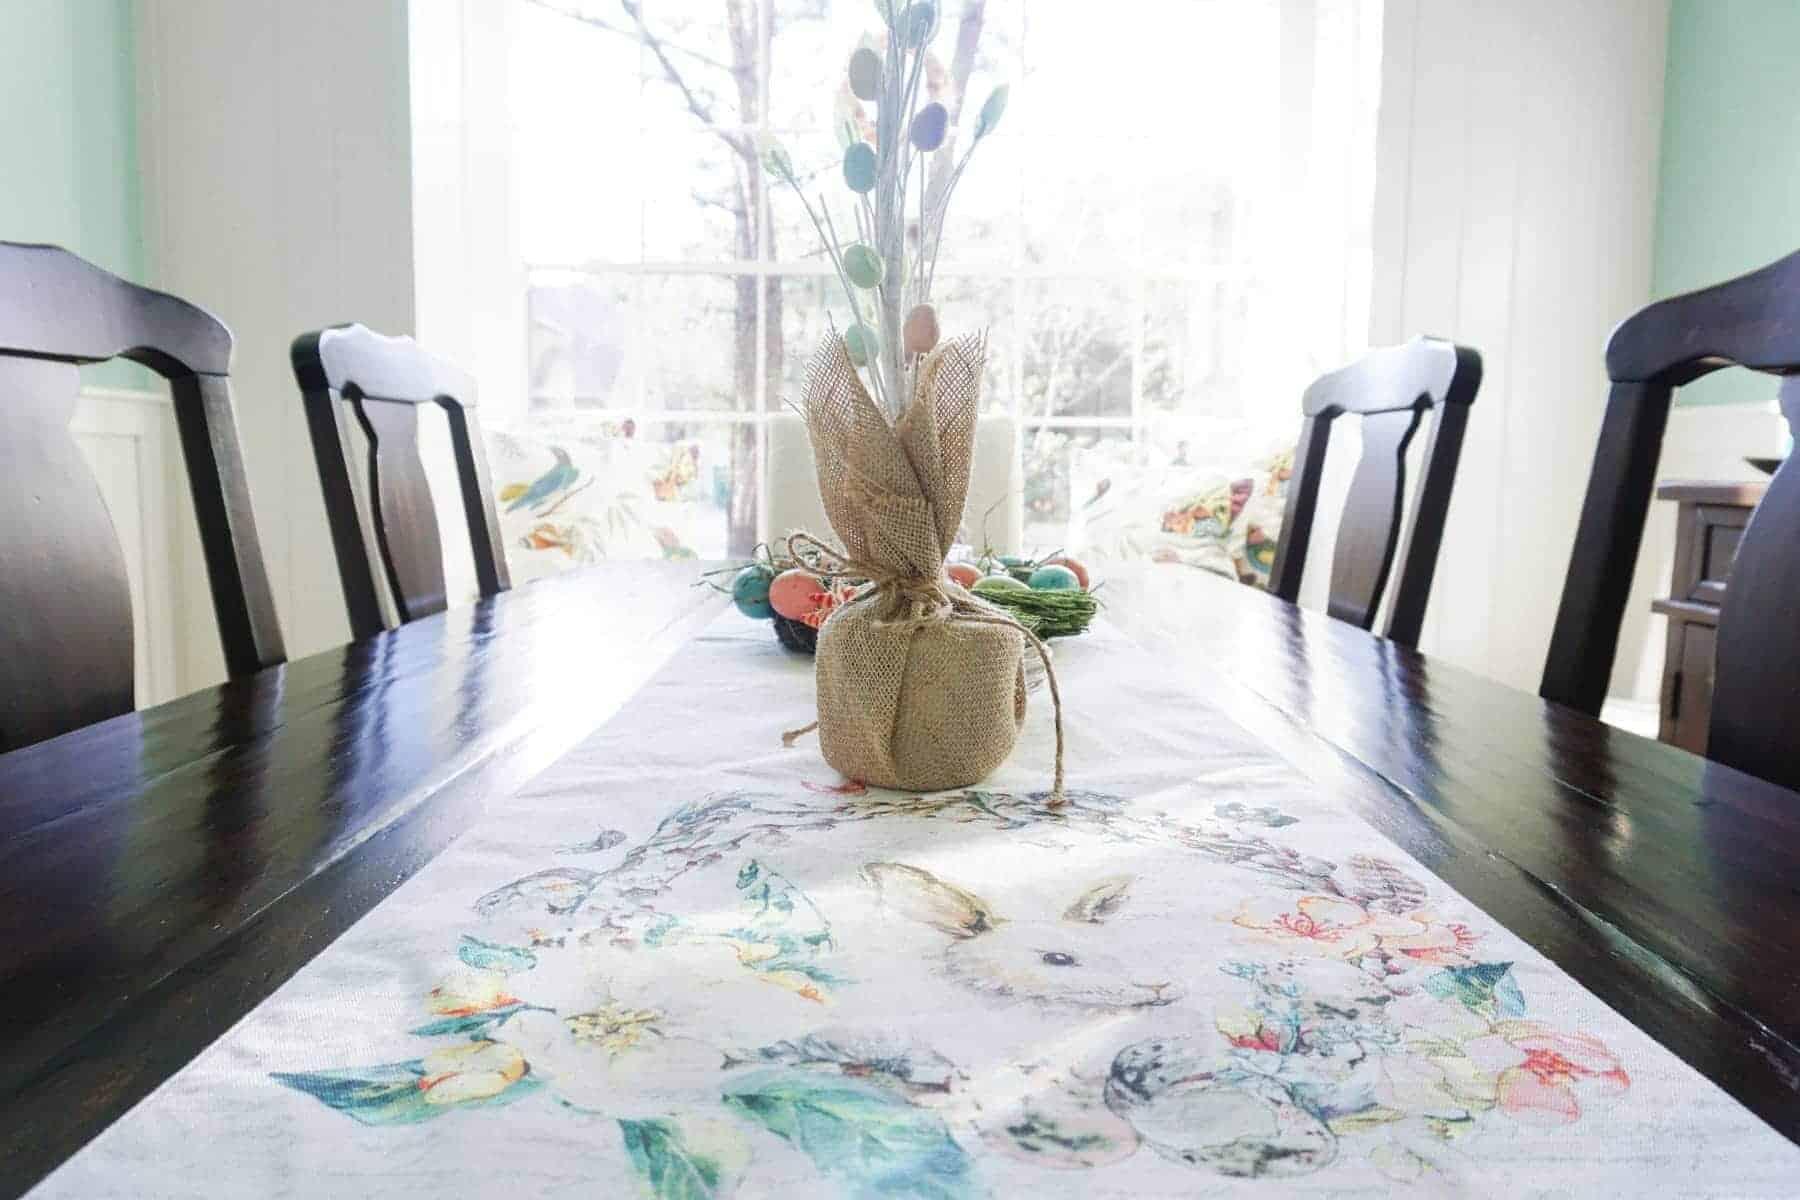 Eater Bunny Runner on Dining Table